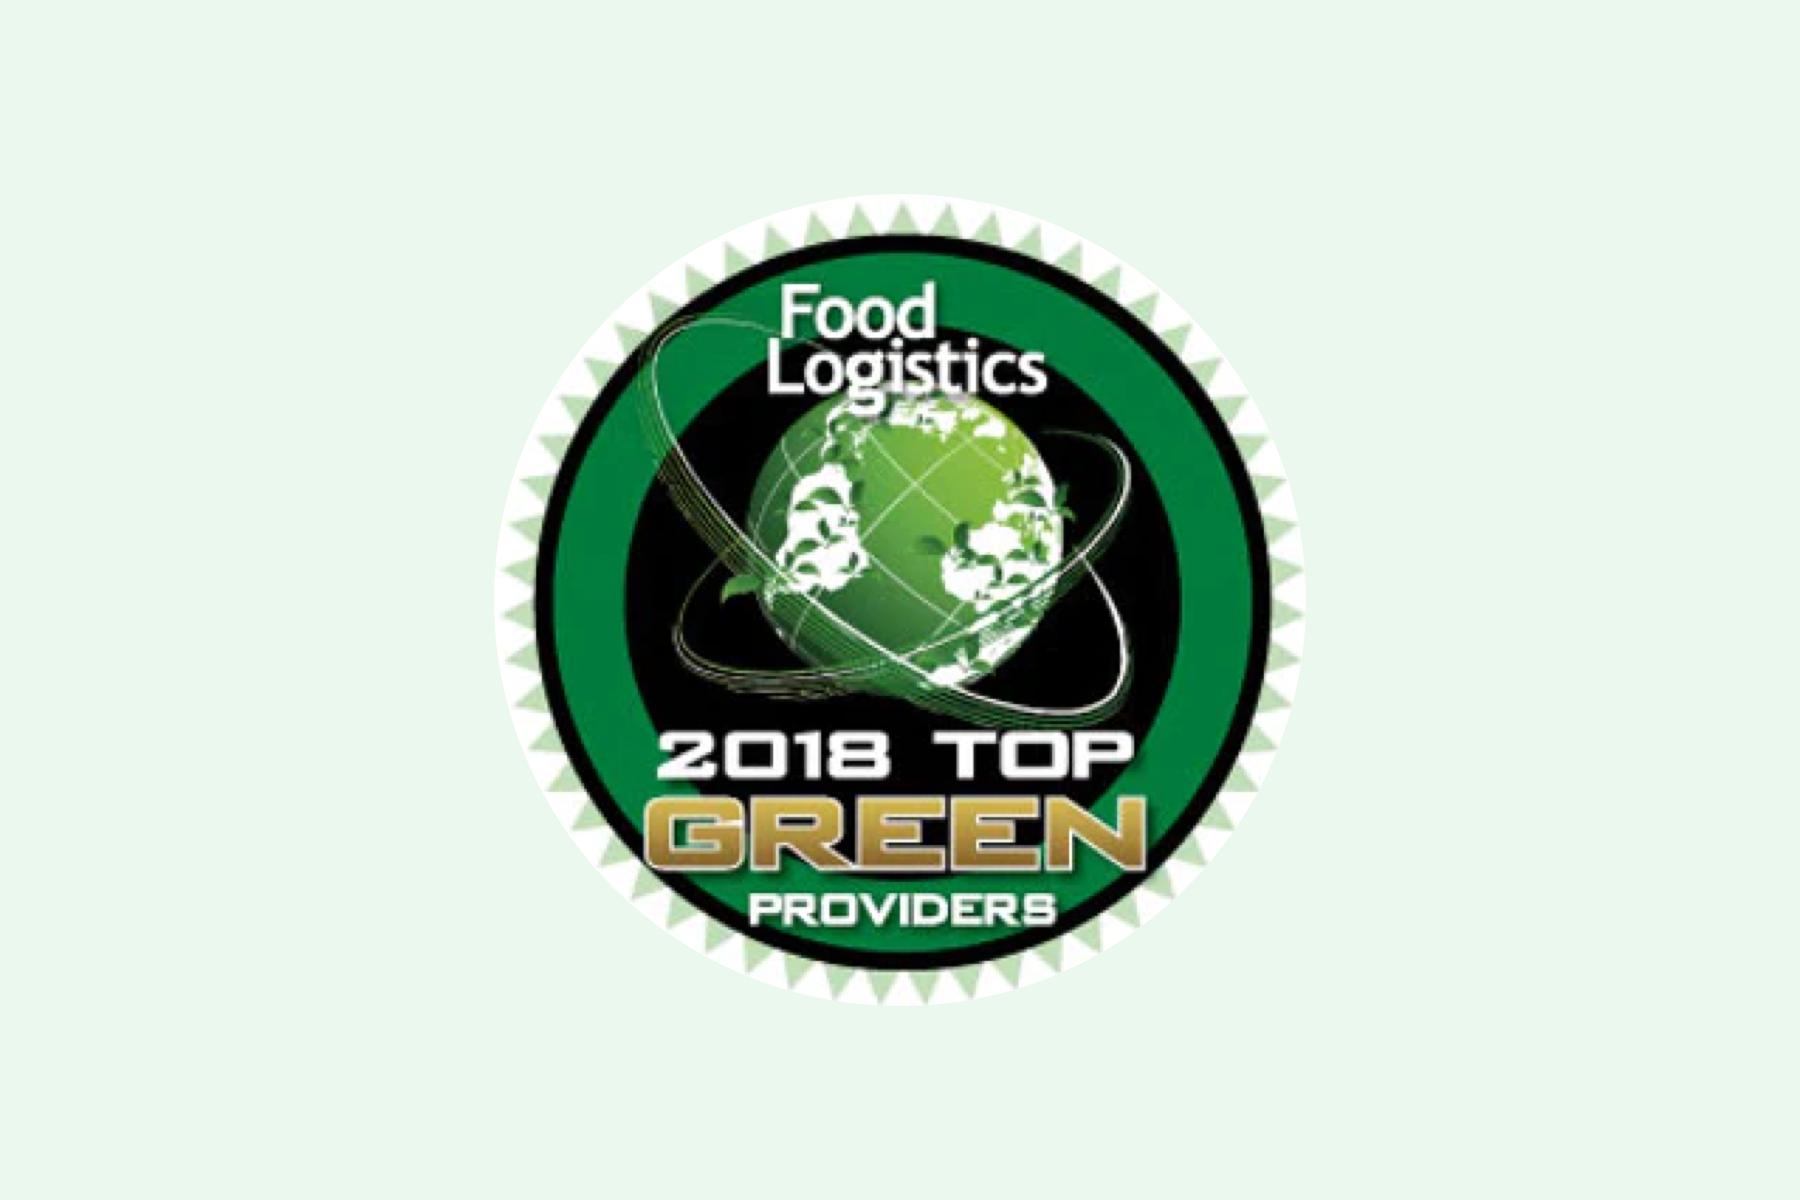 Food Logistics 2018 Top Green Providers List 2018 Logo